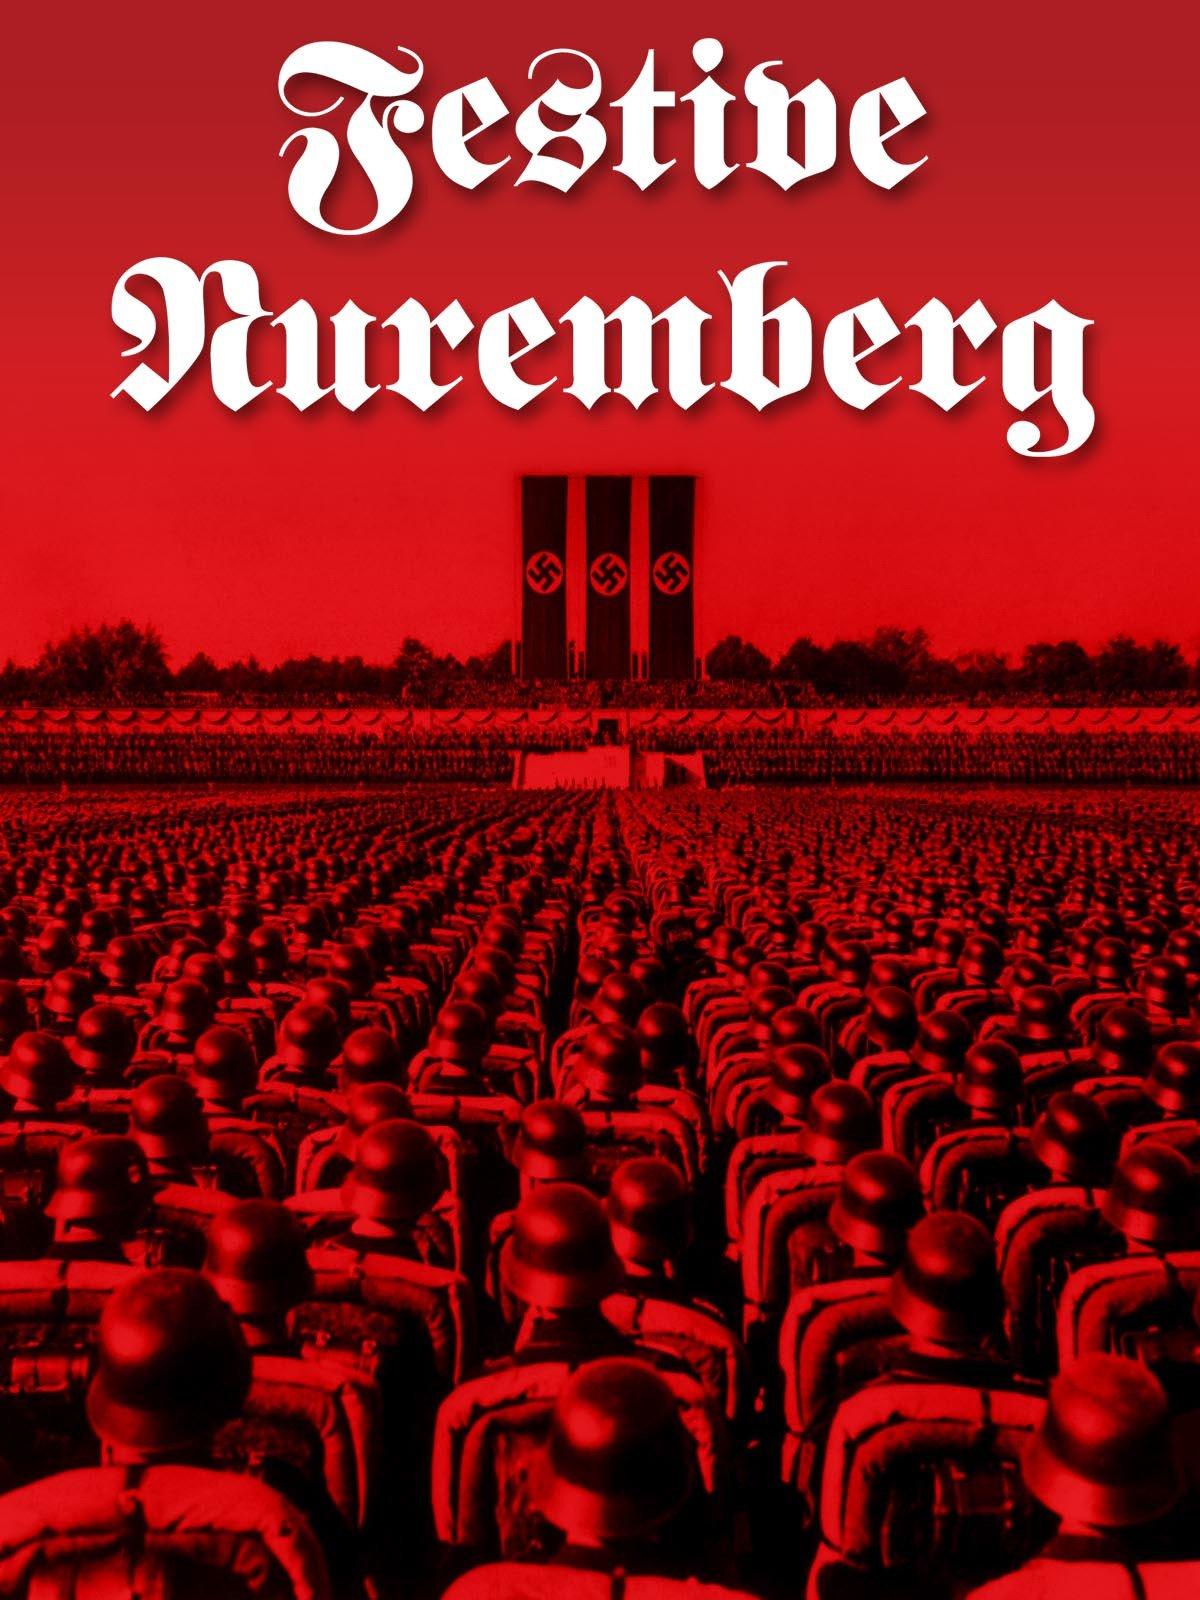 Festive Nuremberg